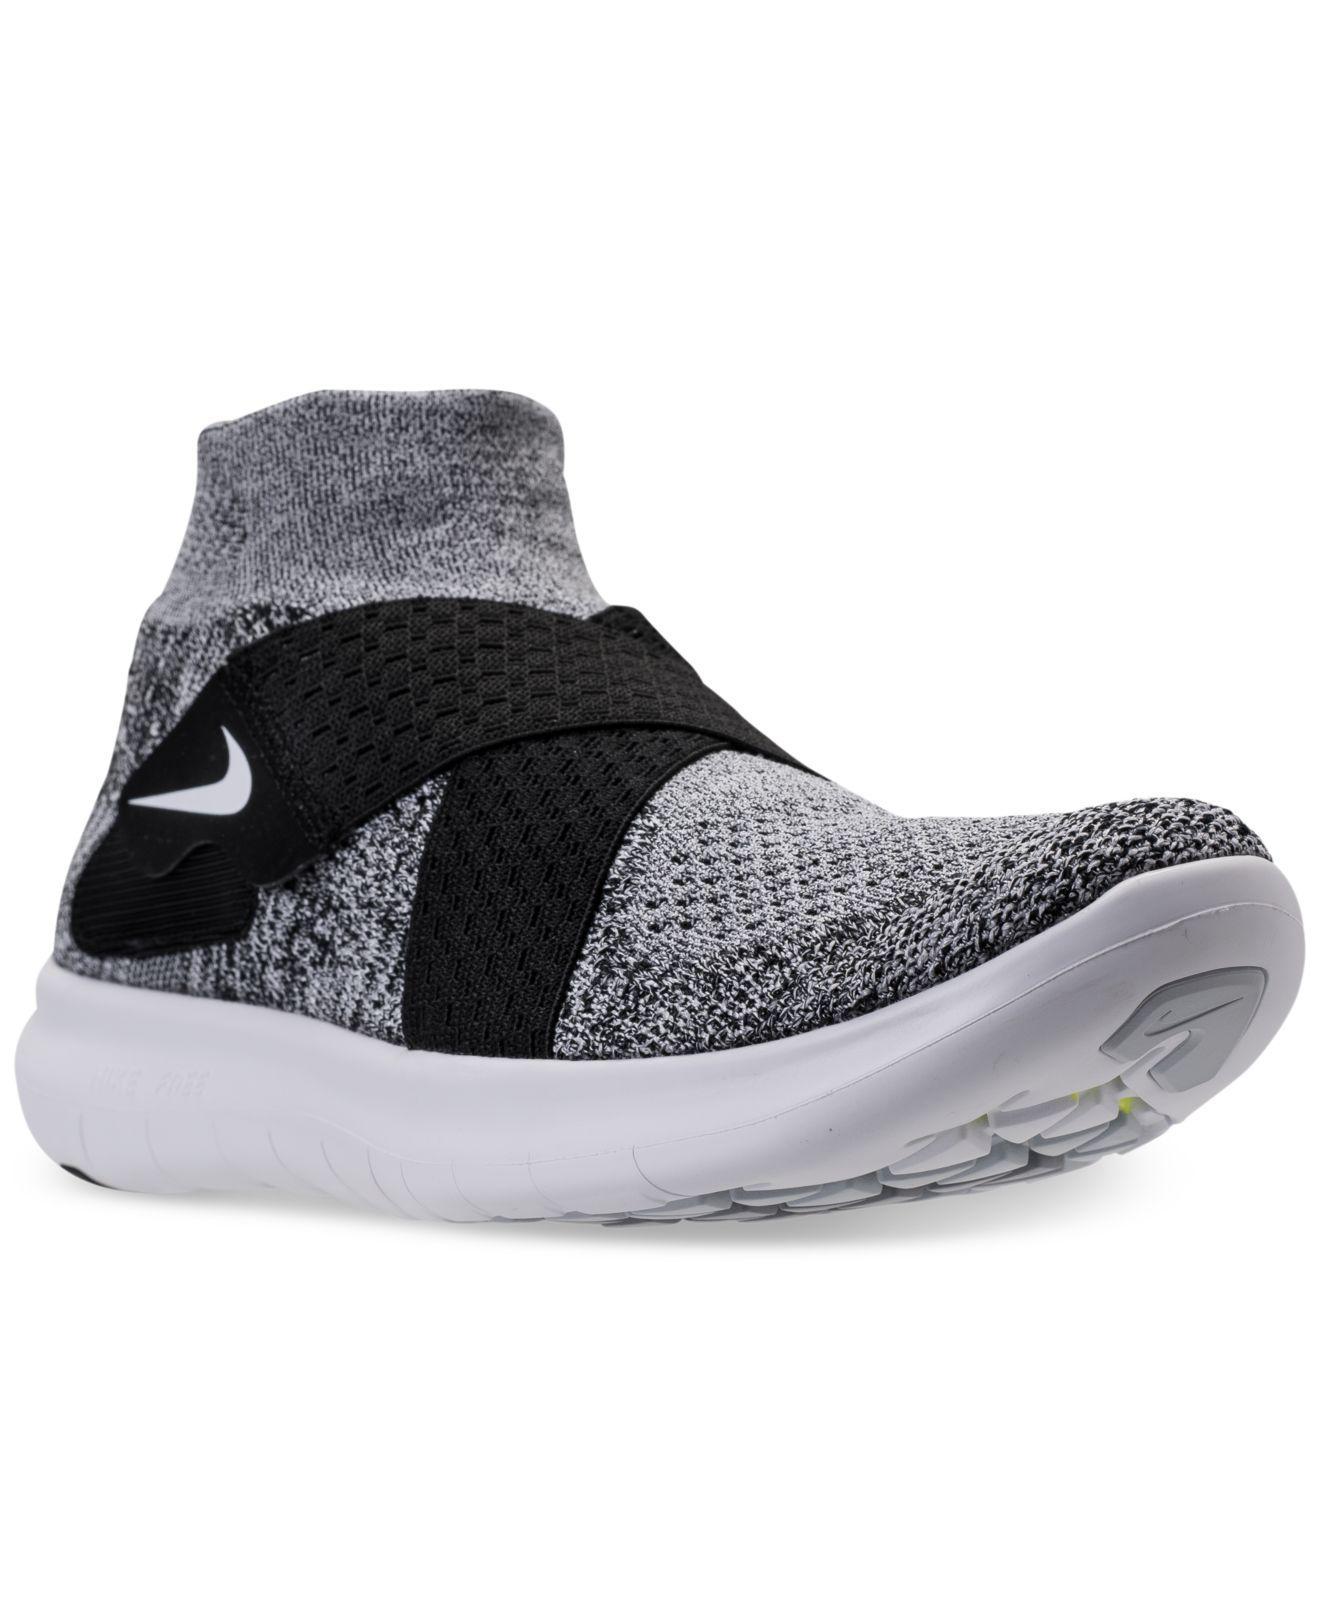 fcae2aebbcd ... shop lyst nike womens free run motion flyknit 2017 running sneakers  8c79d 74019 ...